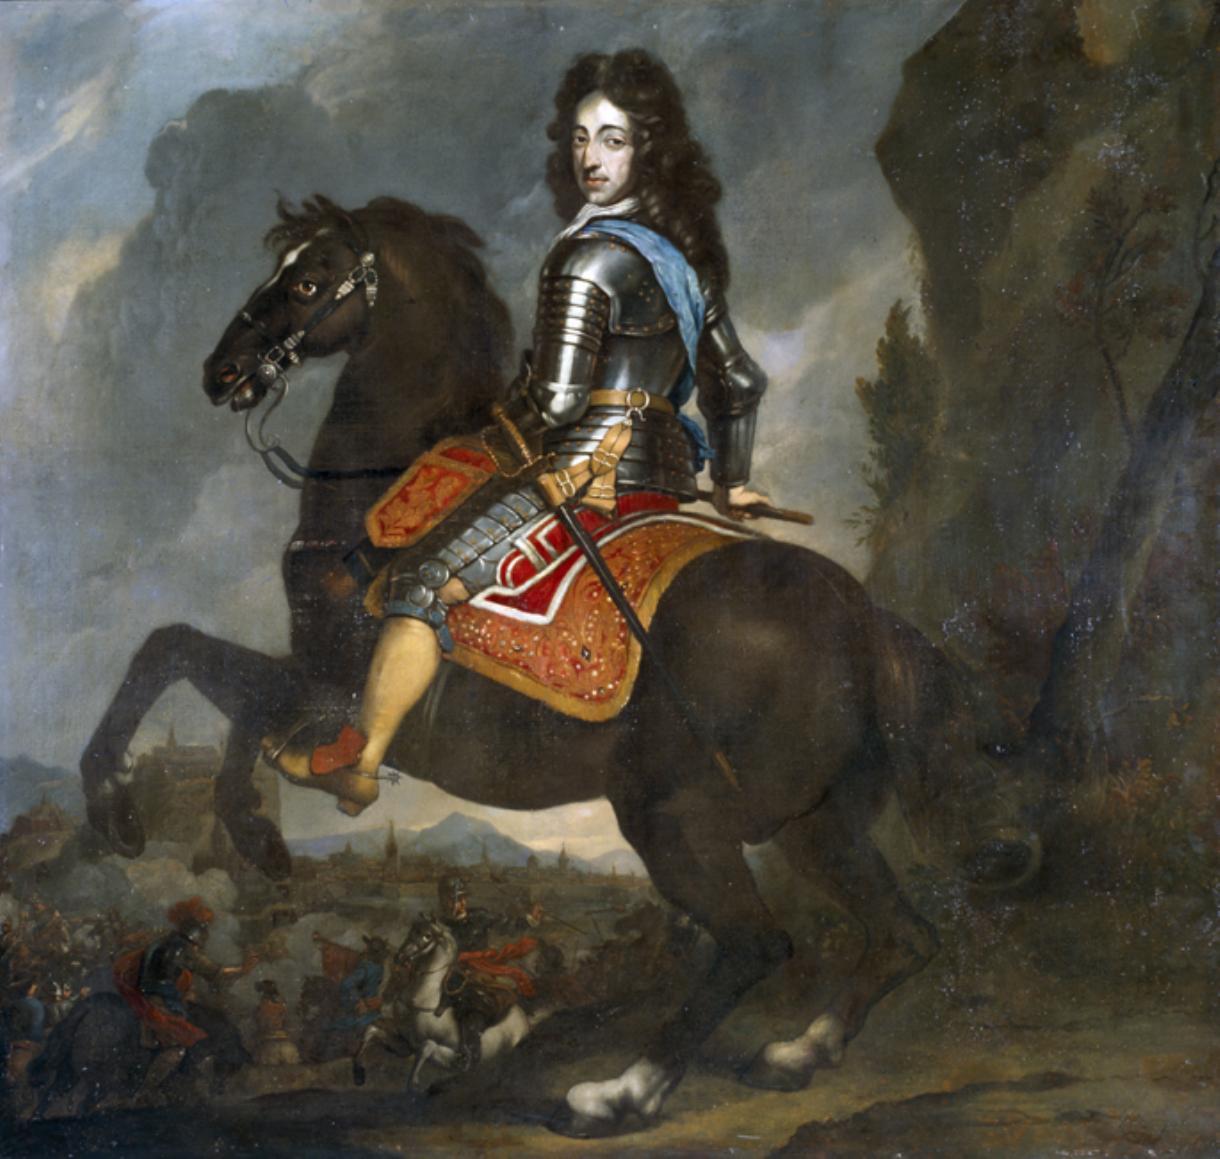 Equestrian portrait of William III, second half of the 17th century, Johannes Voorhout, Netherlands